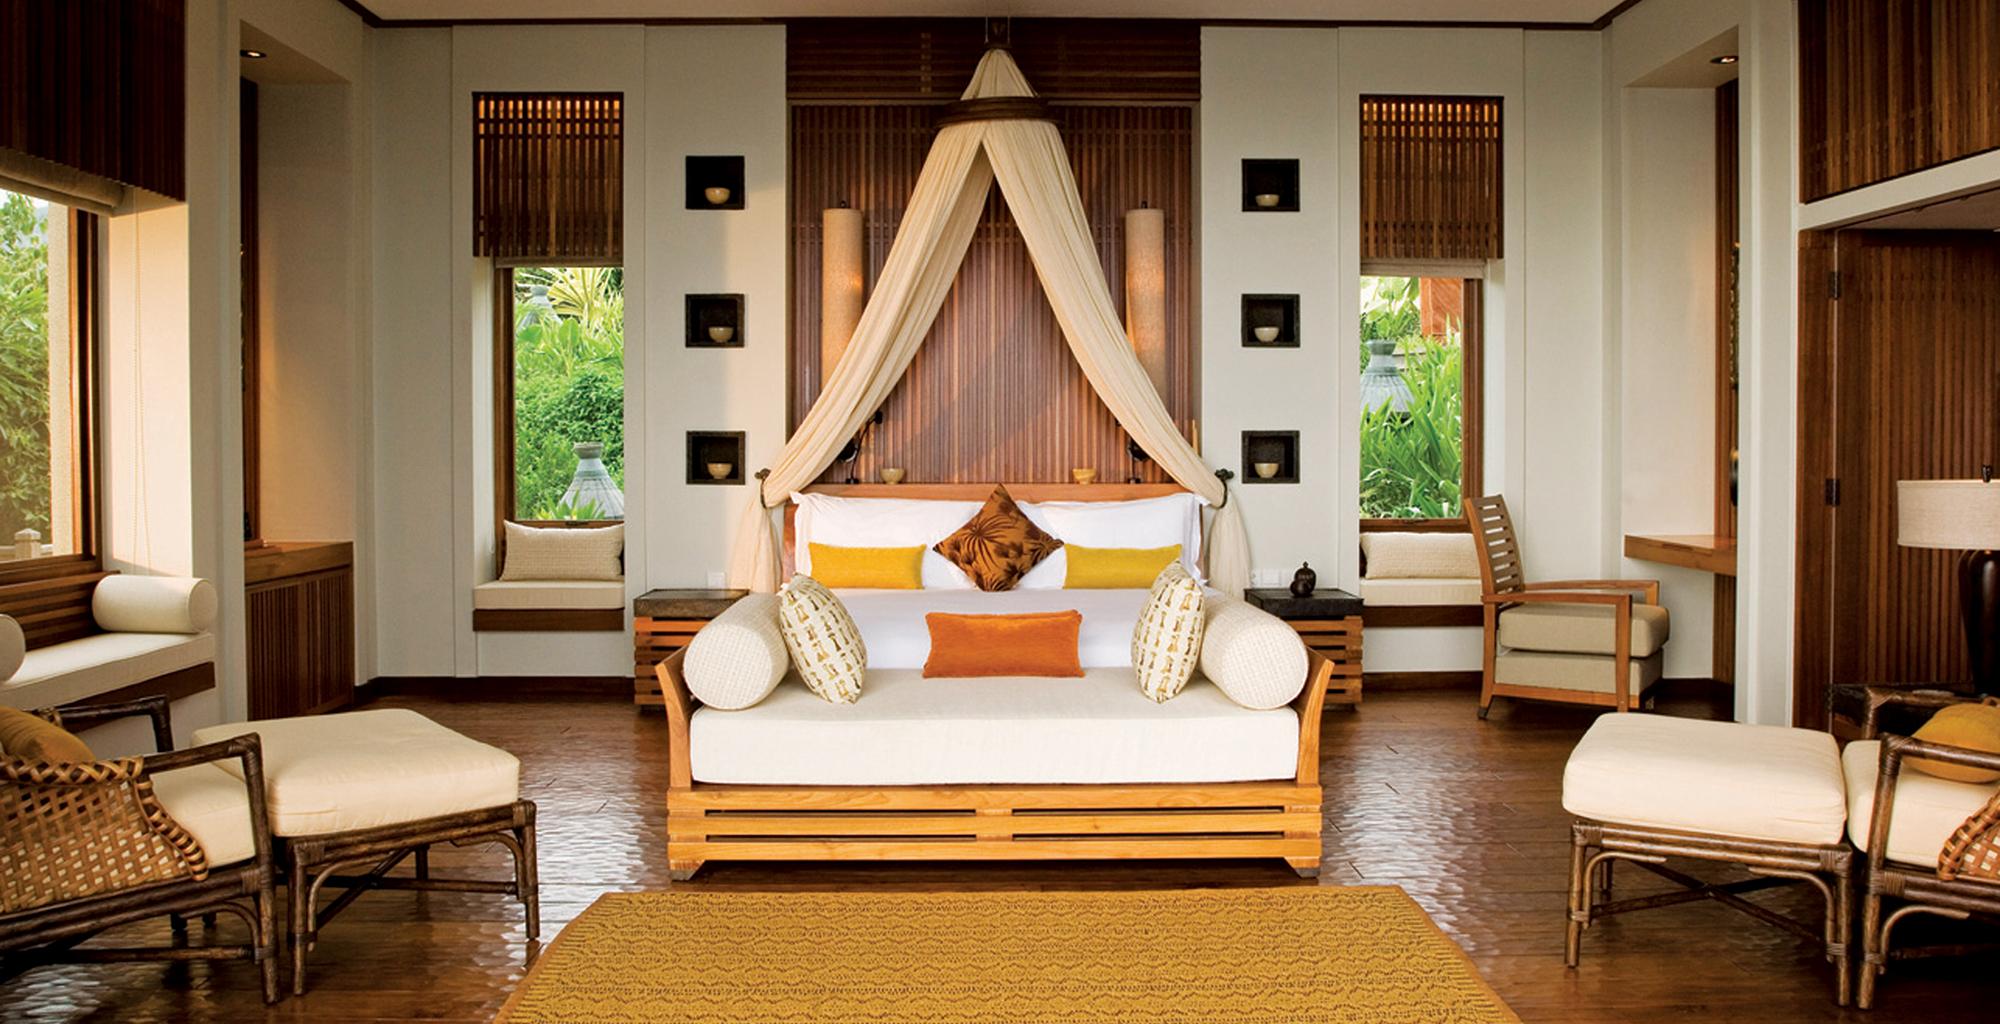 Seychelles-Maia-Luxury-Resort-Bedroom-Interior